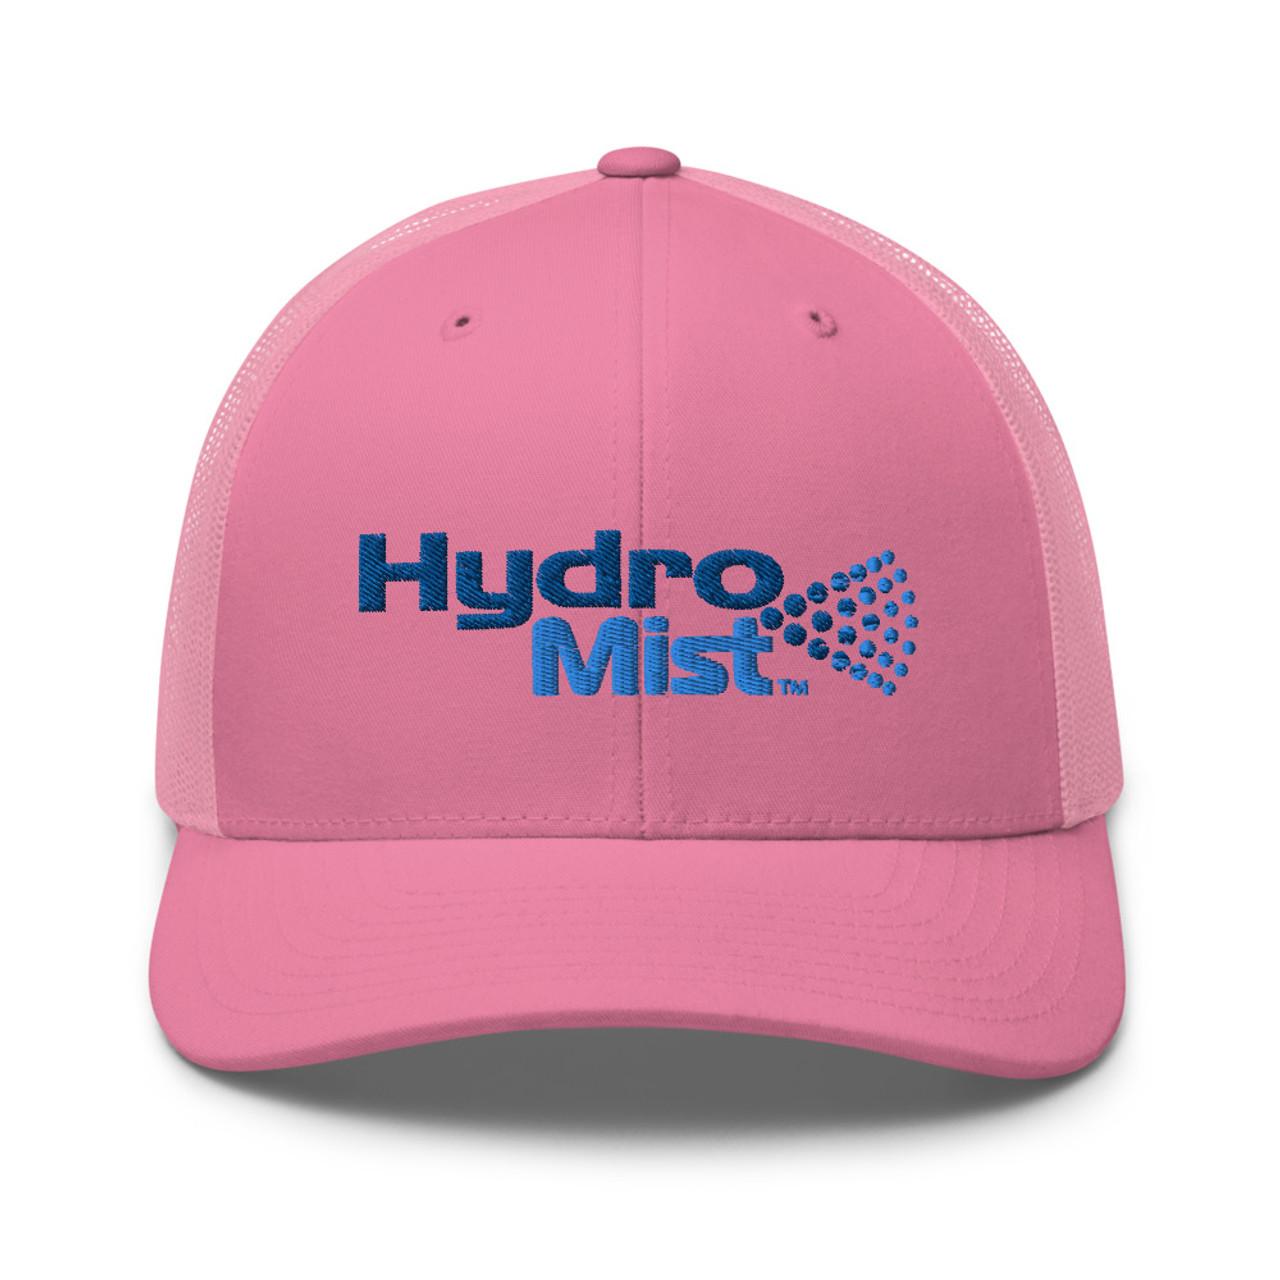 HydroMist Trucker Cap